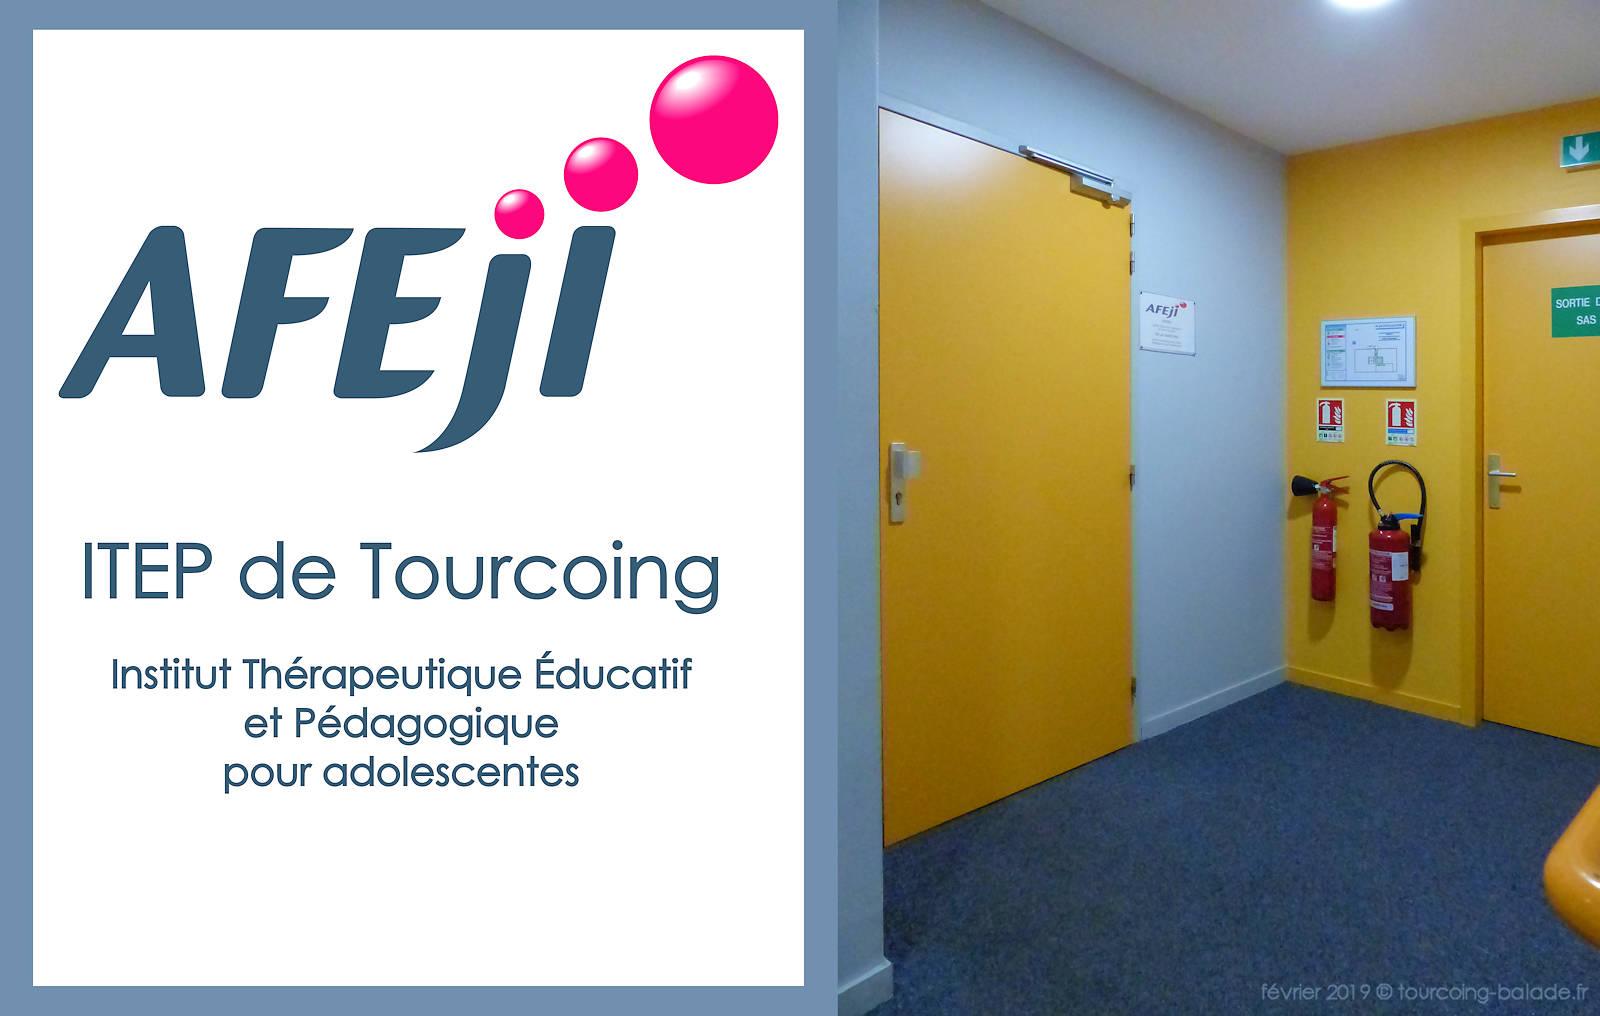 AFEJI ITEP Tourcoing